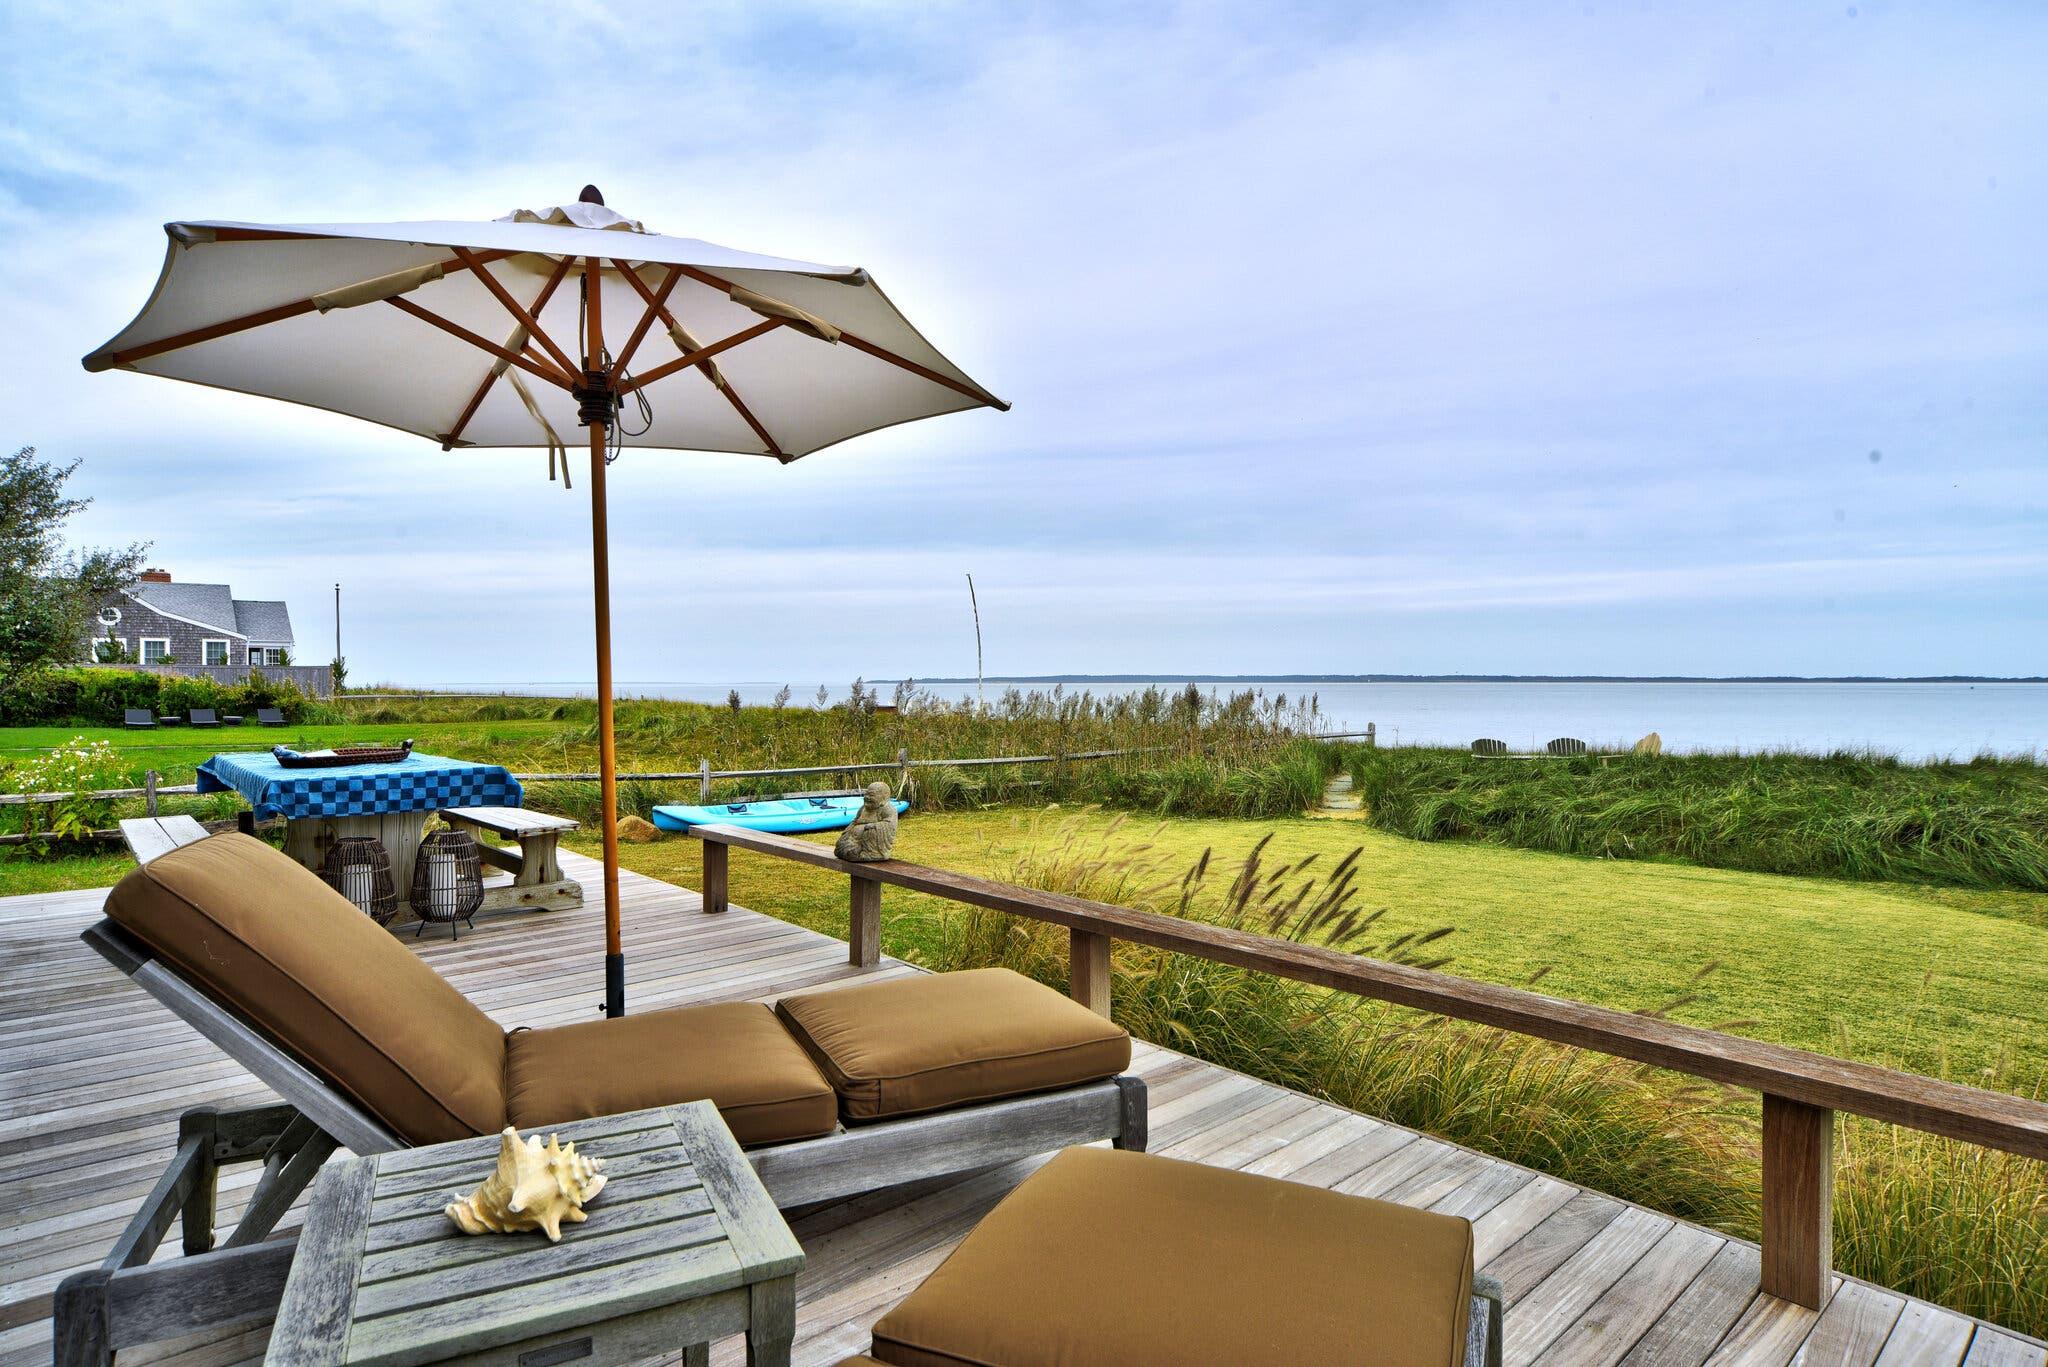 Terraza con vistas al mar / Chris Foster for Sotheby's International Realty